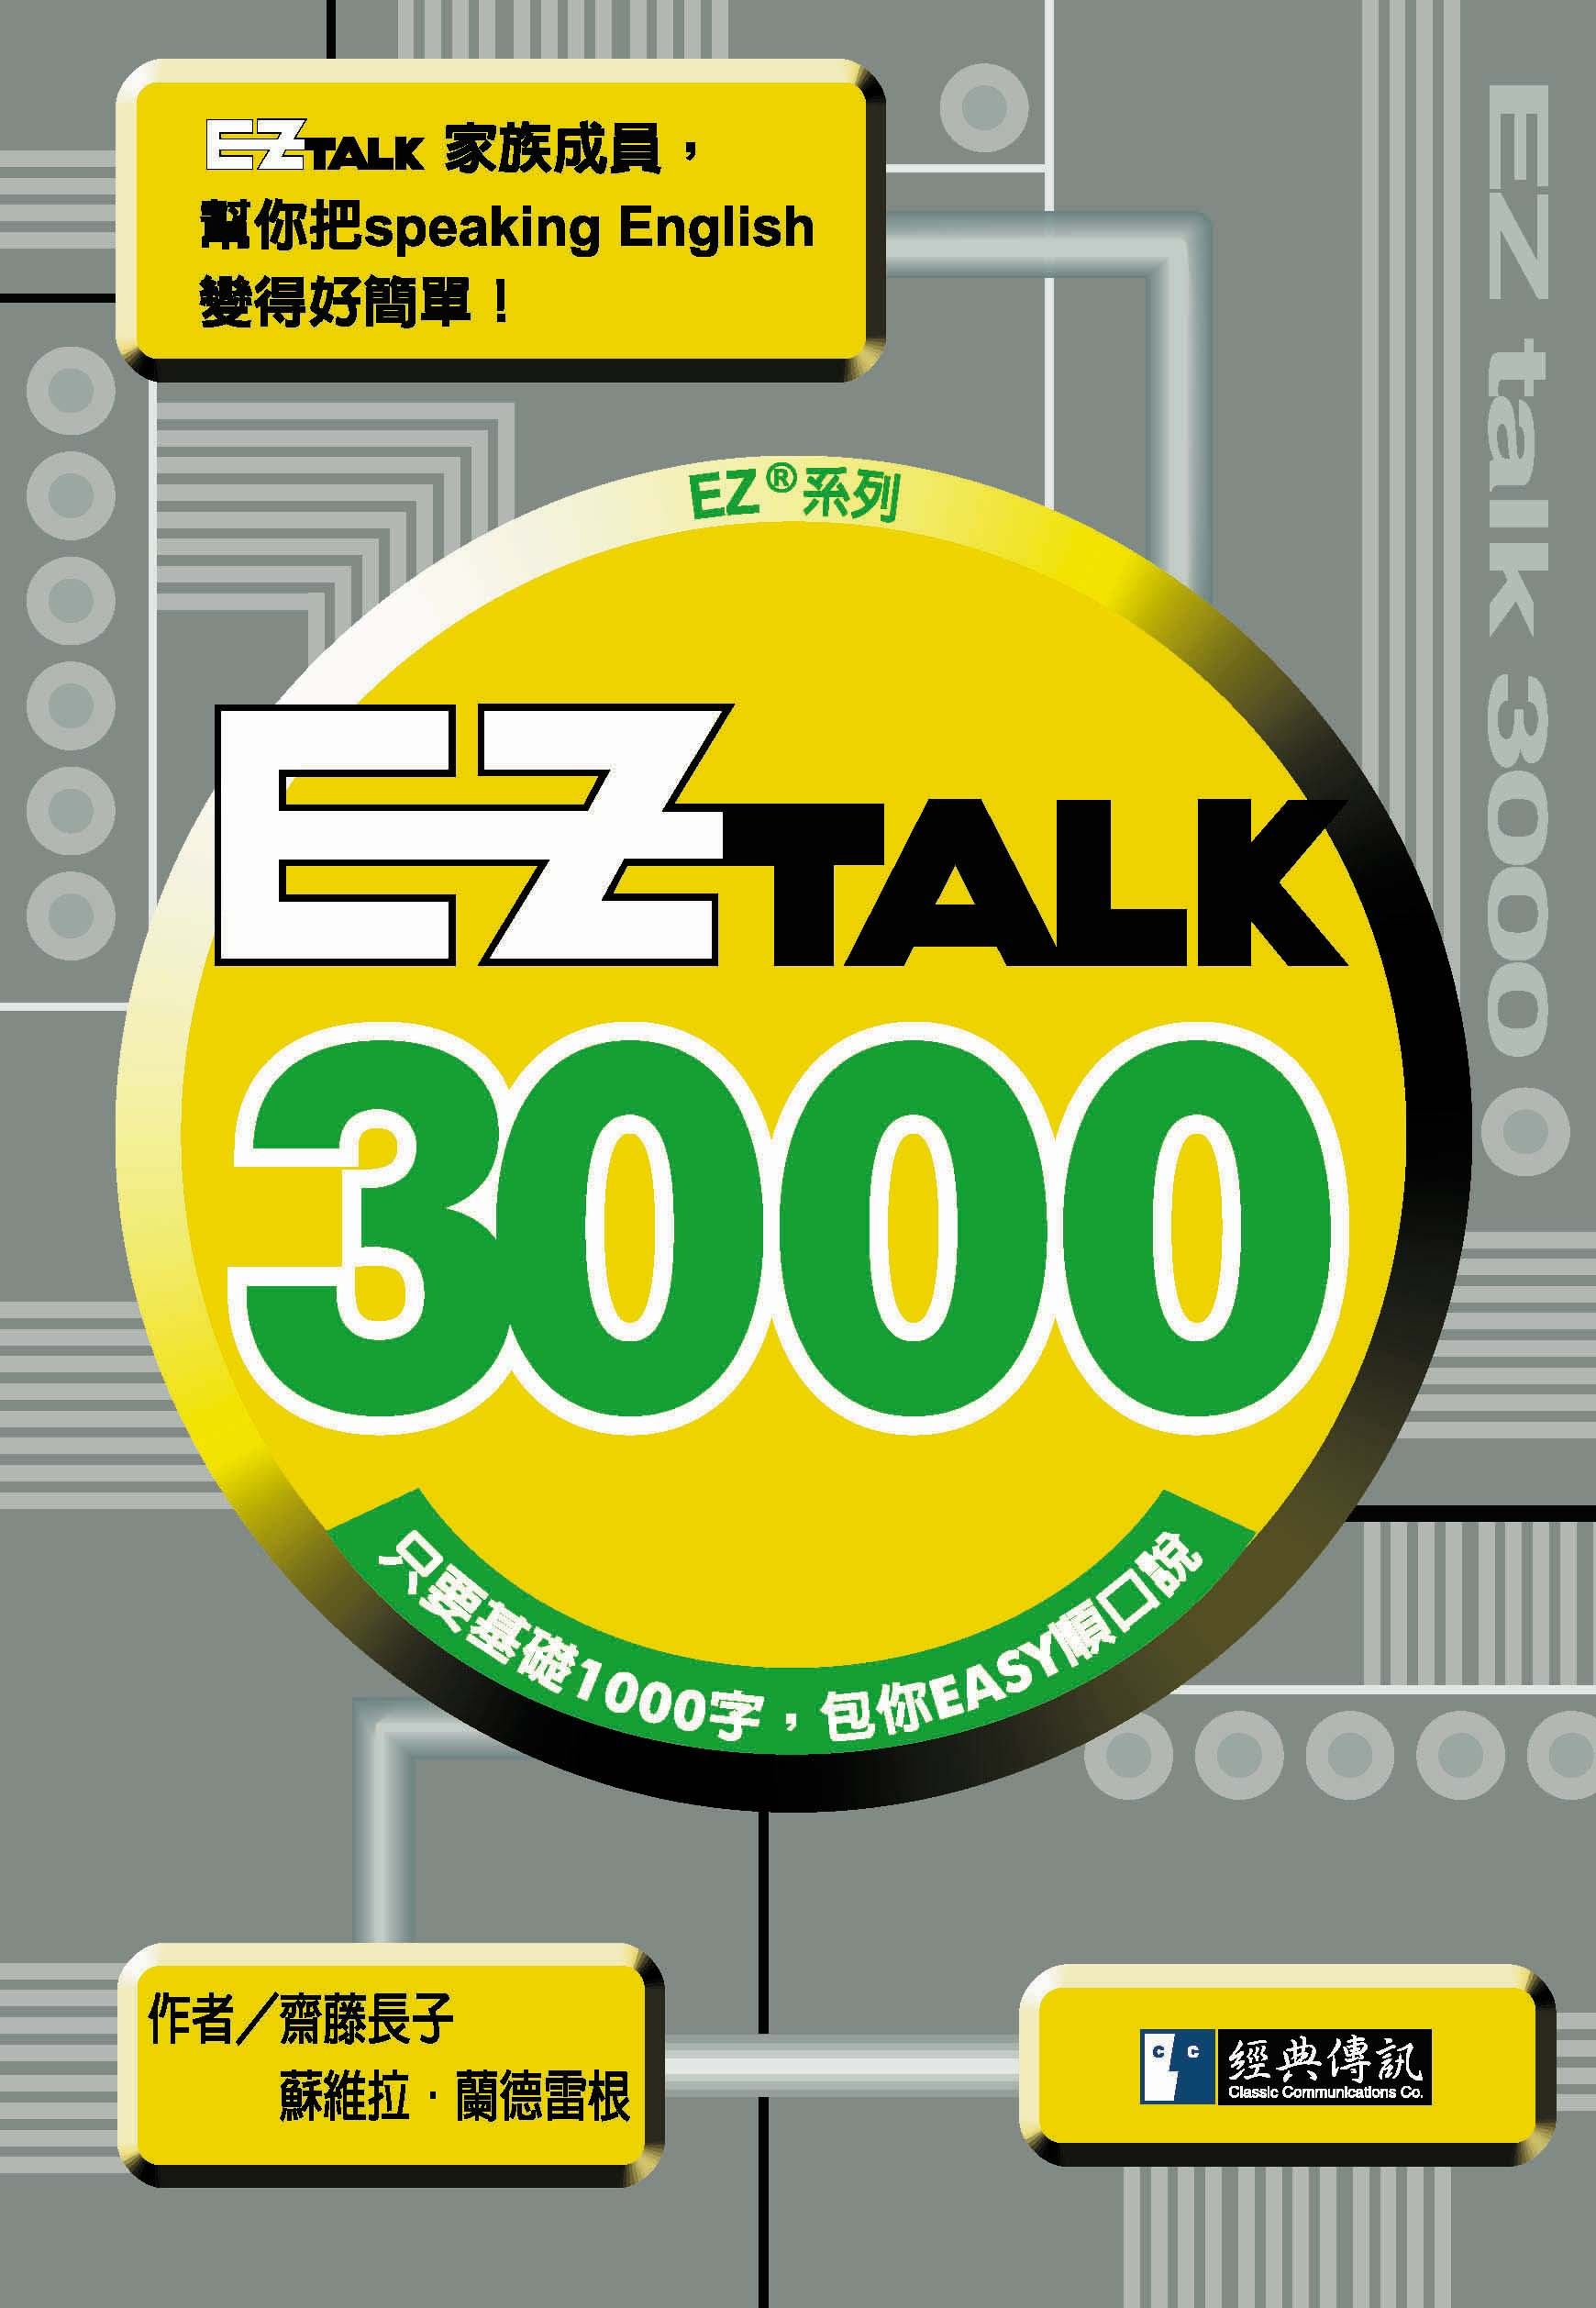 EZ Talk 3000